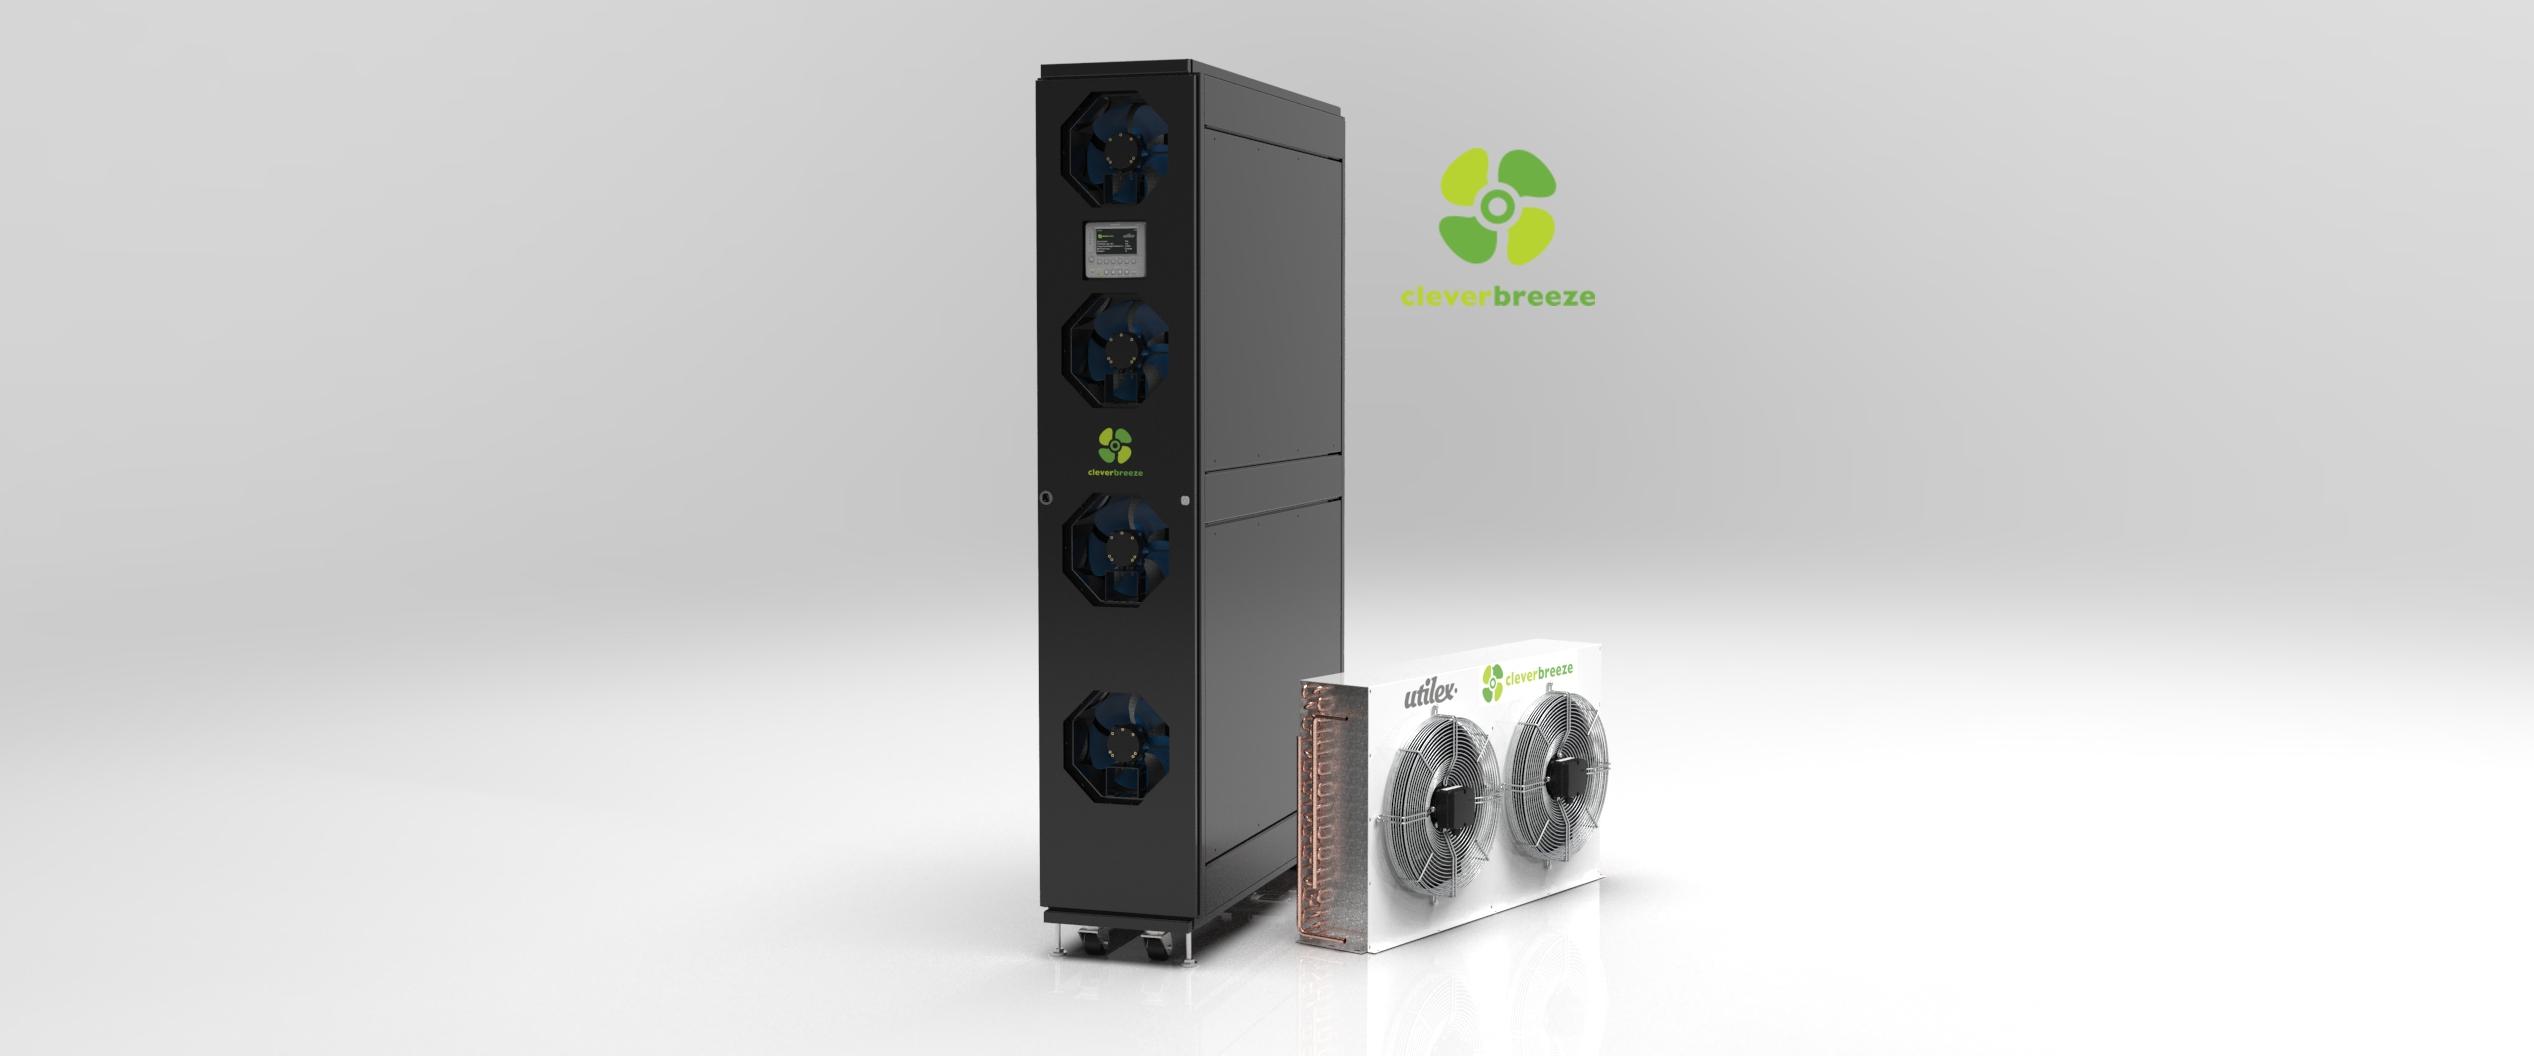 Air datacenter cooling CleverBreeze